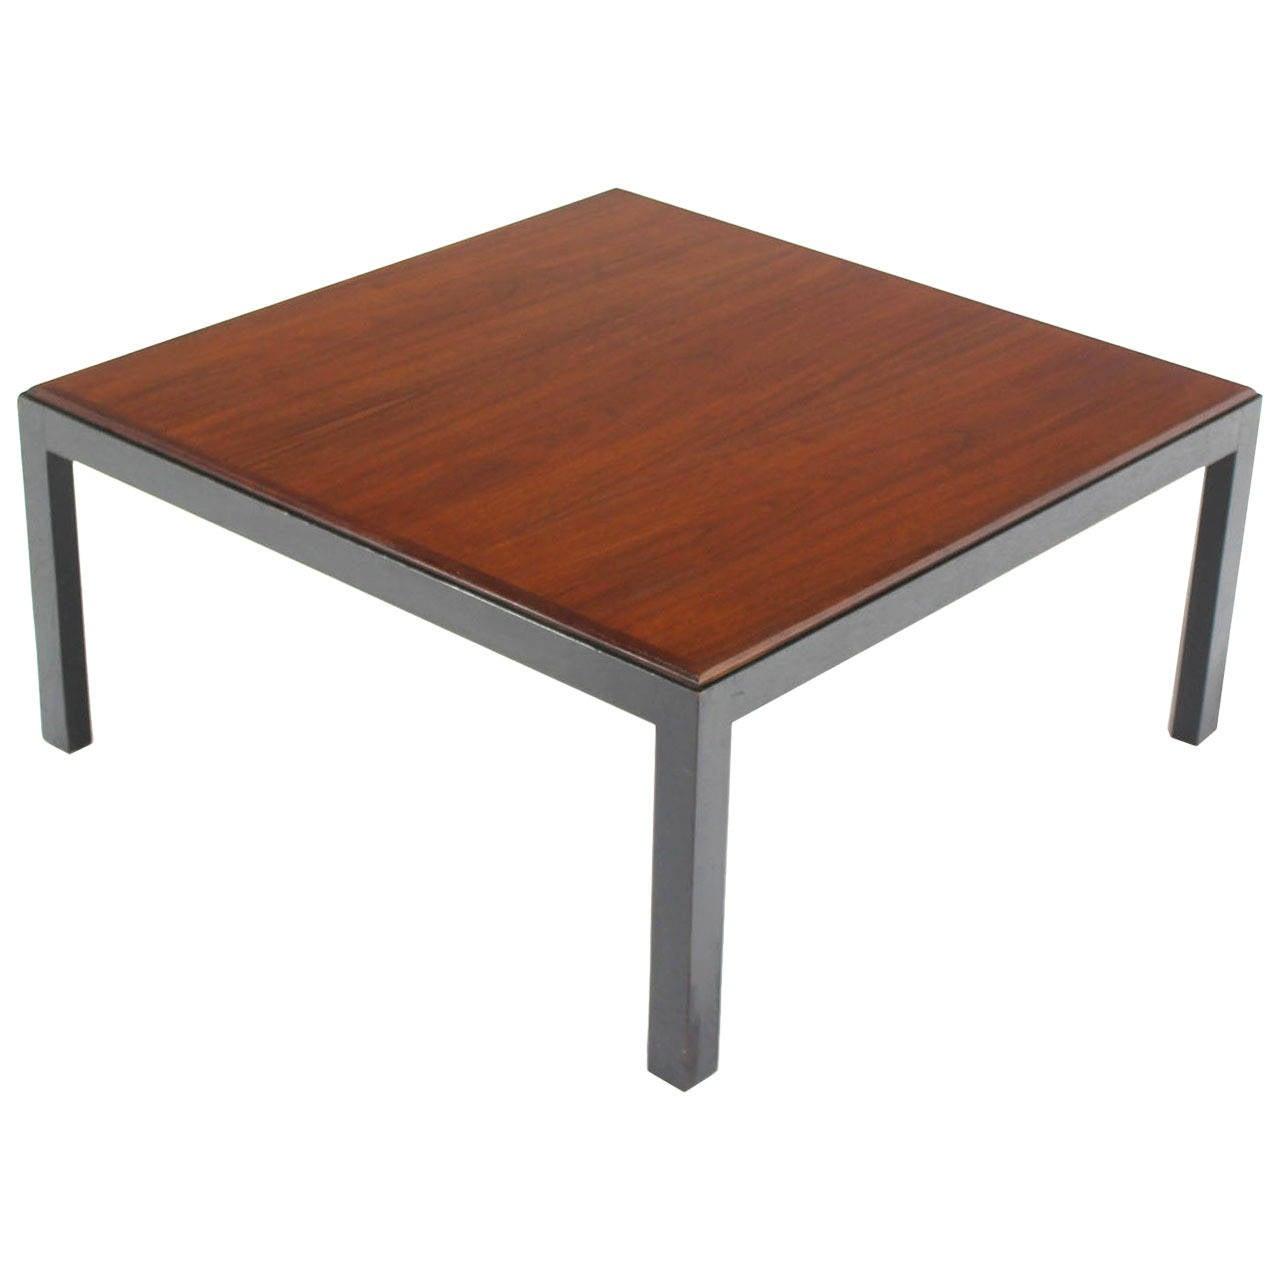 Ebonised Frame Walnut Top Square Coffee Table At 1stdibs